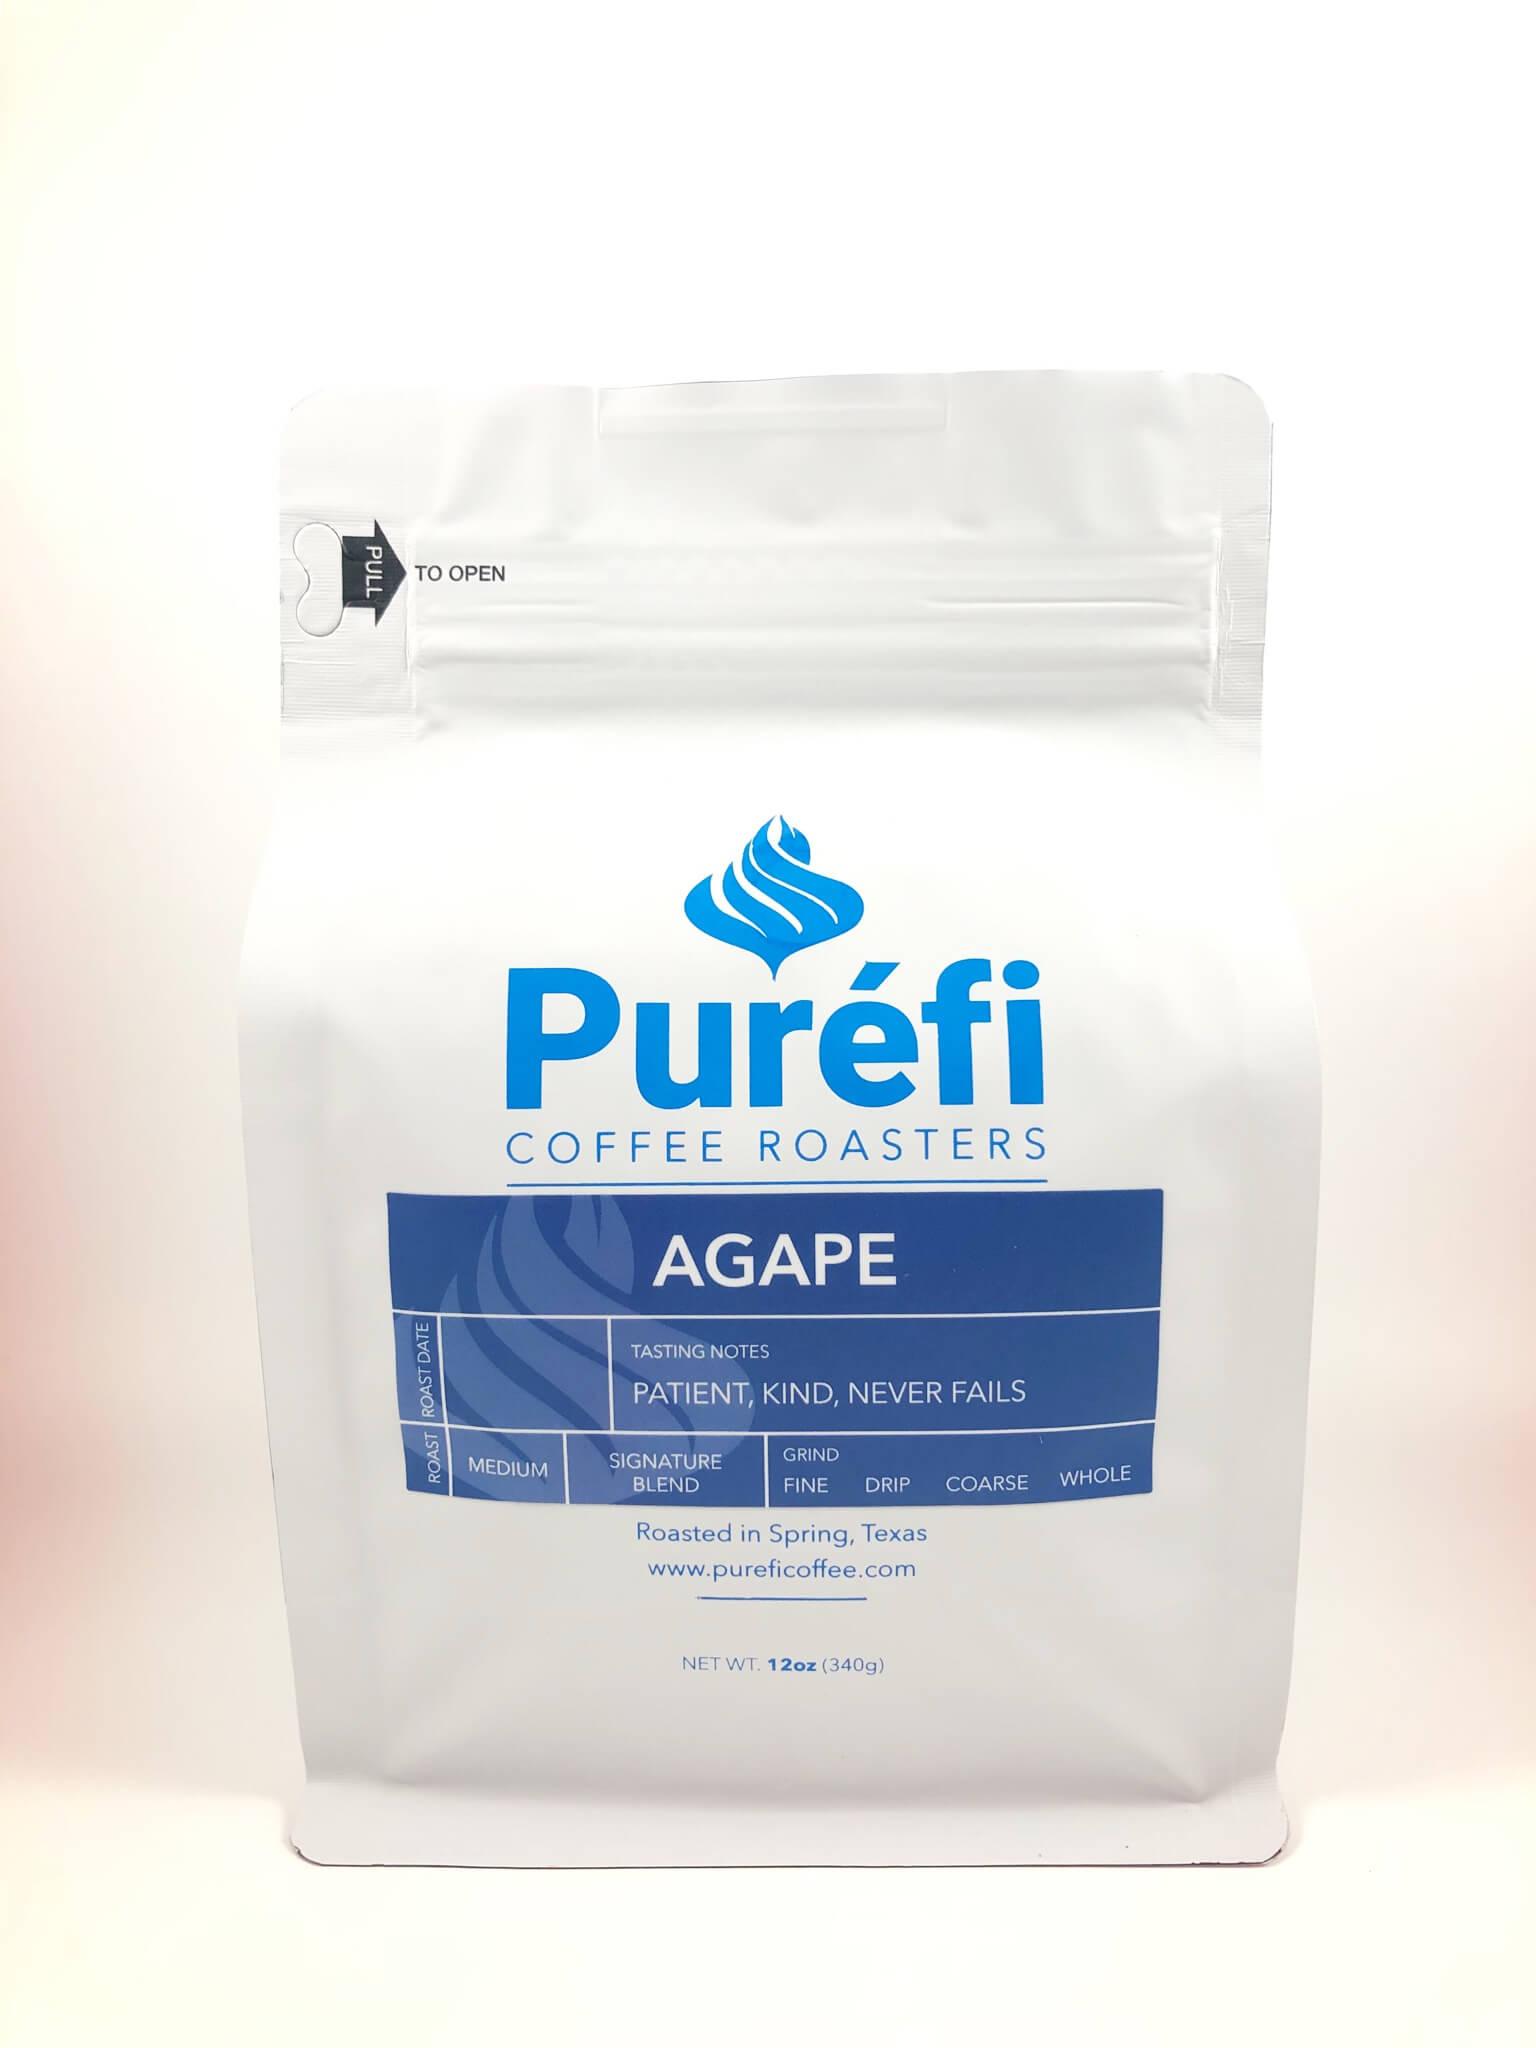 Agape from Purefi Coffee Roasters